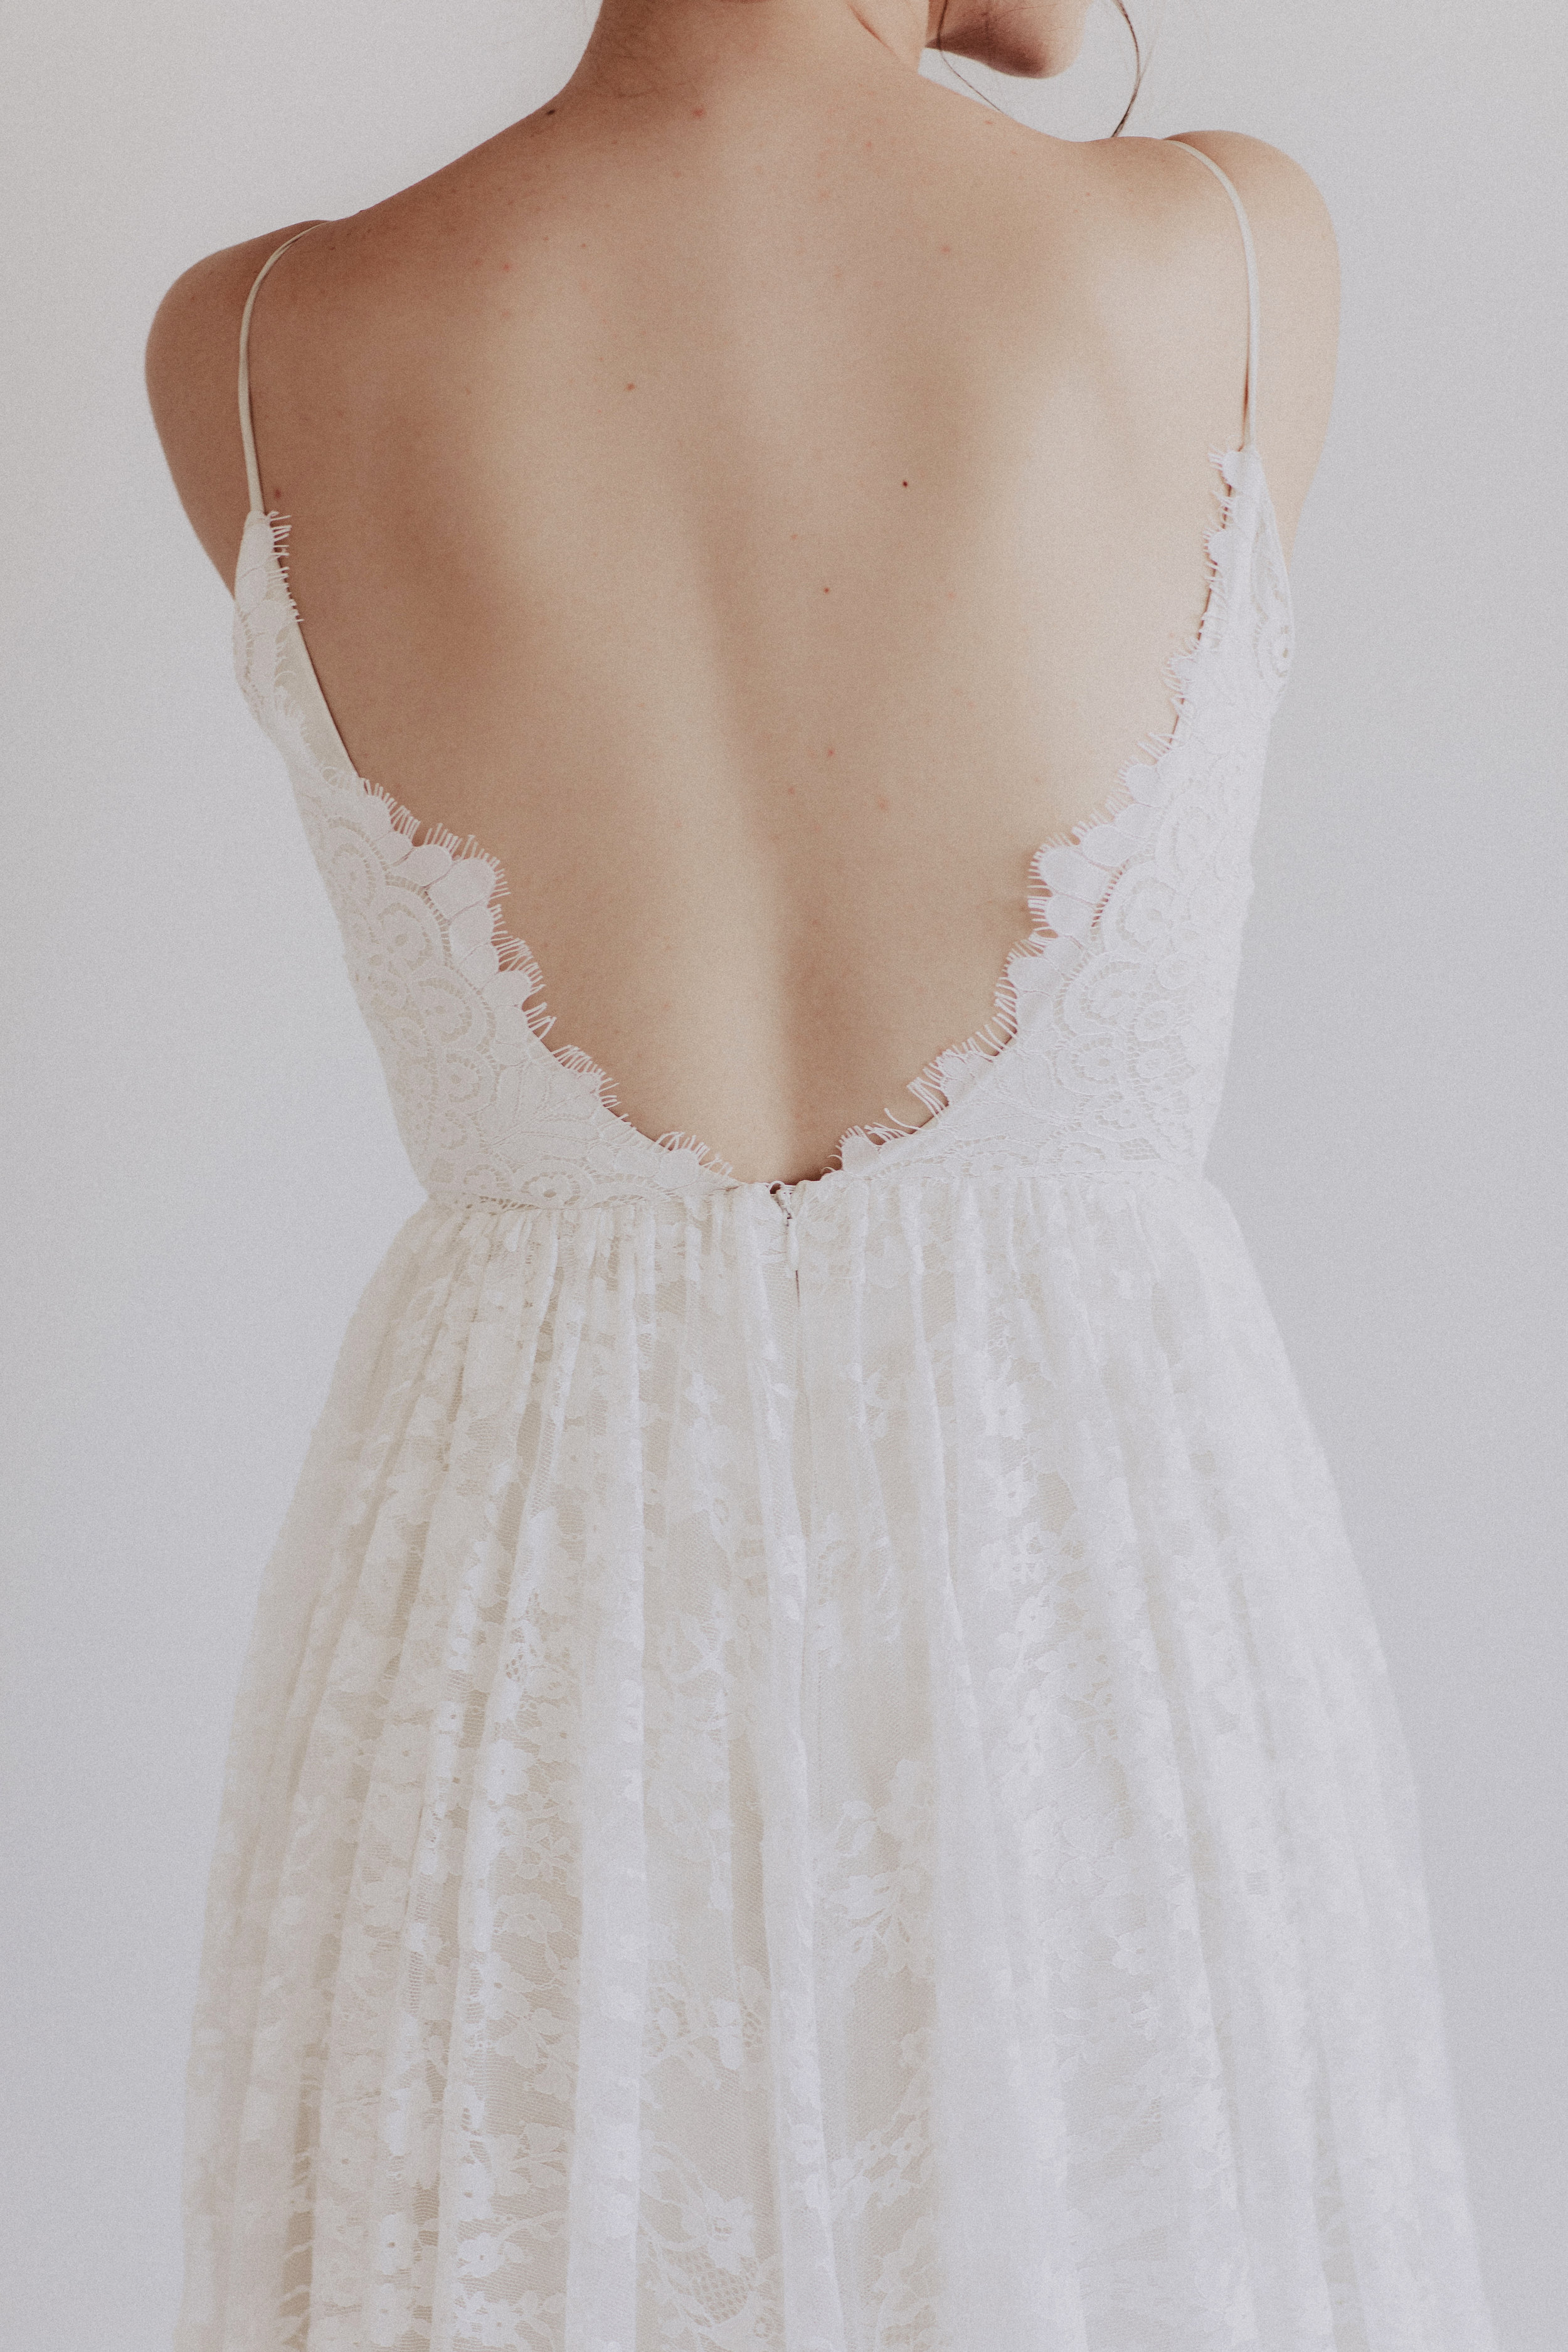 Annie O by Chantel Lauren lace wedding gown a line